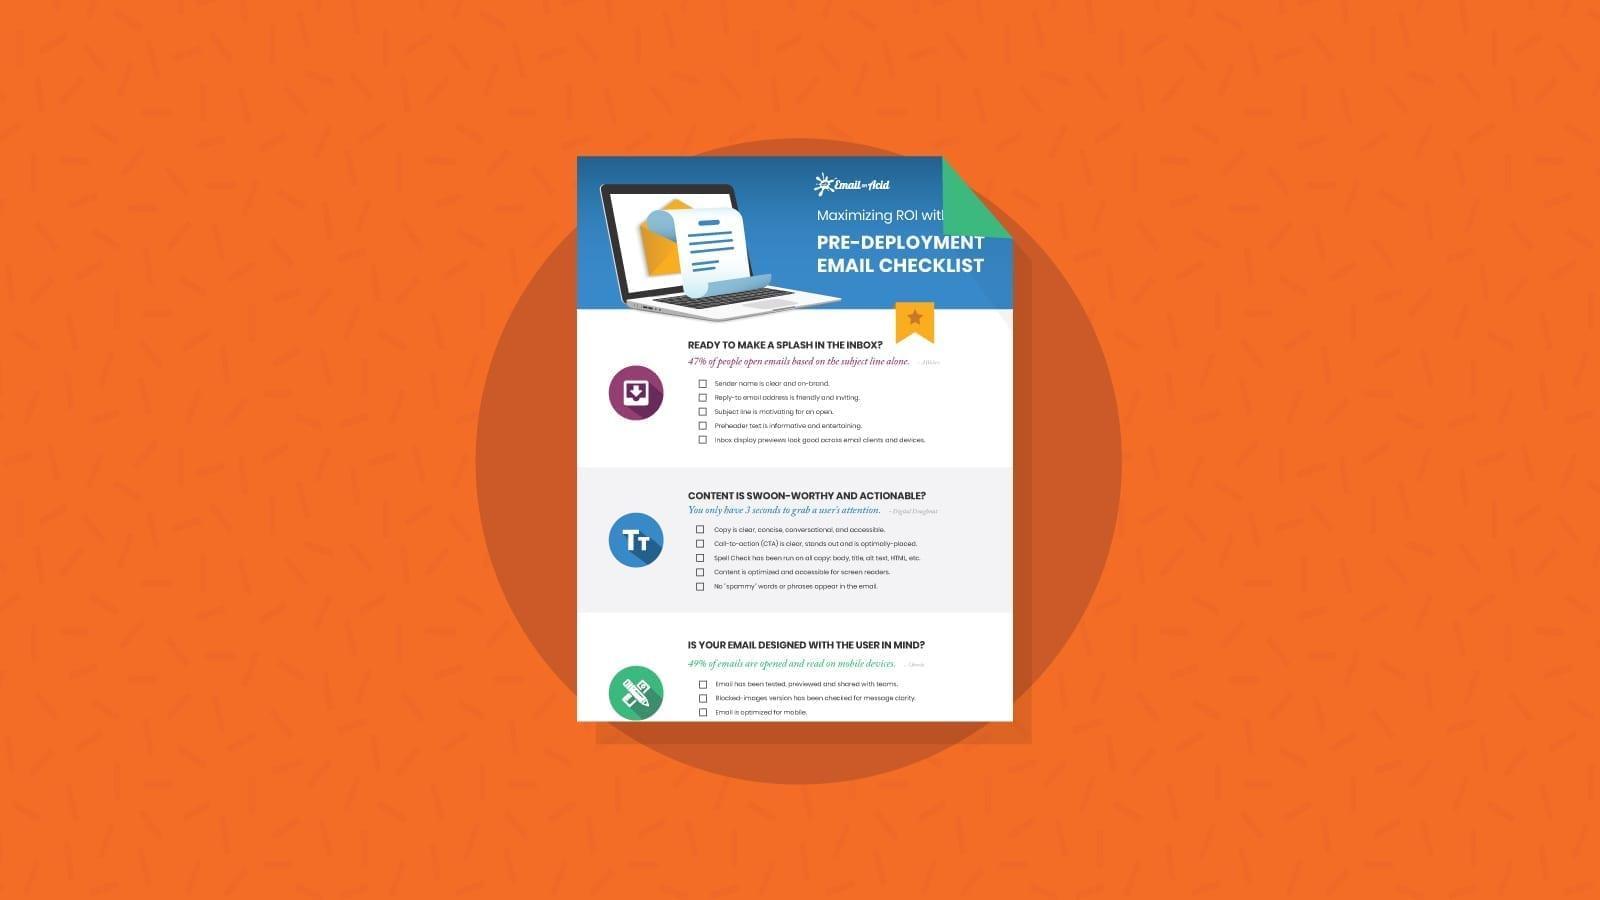 Email Checklist White Paper